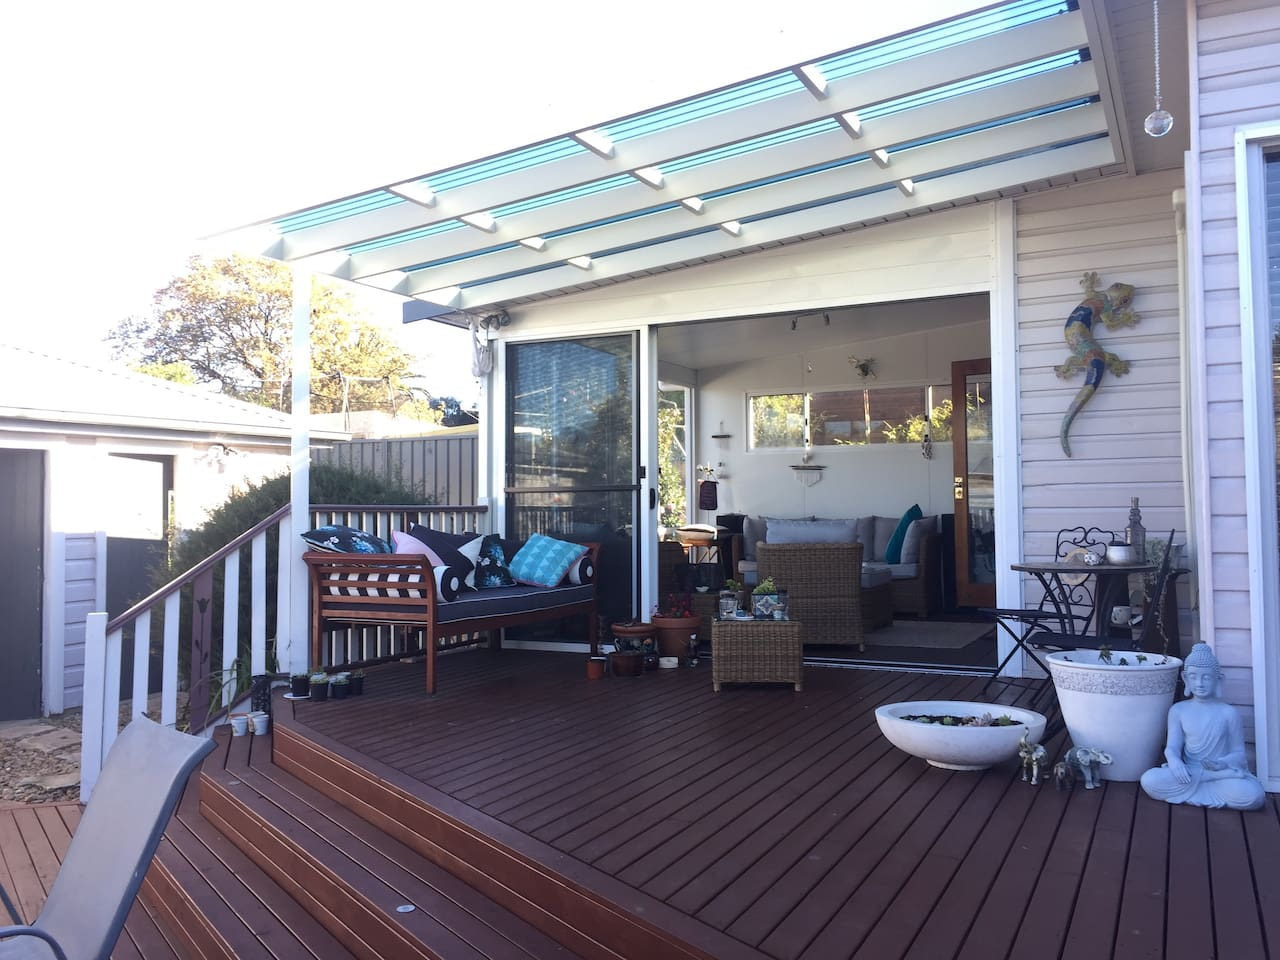 Indoor/outdoor entainment area